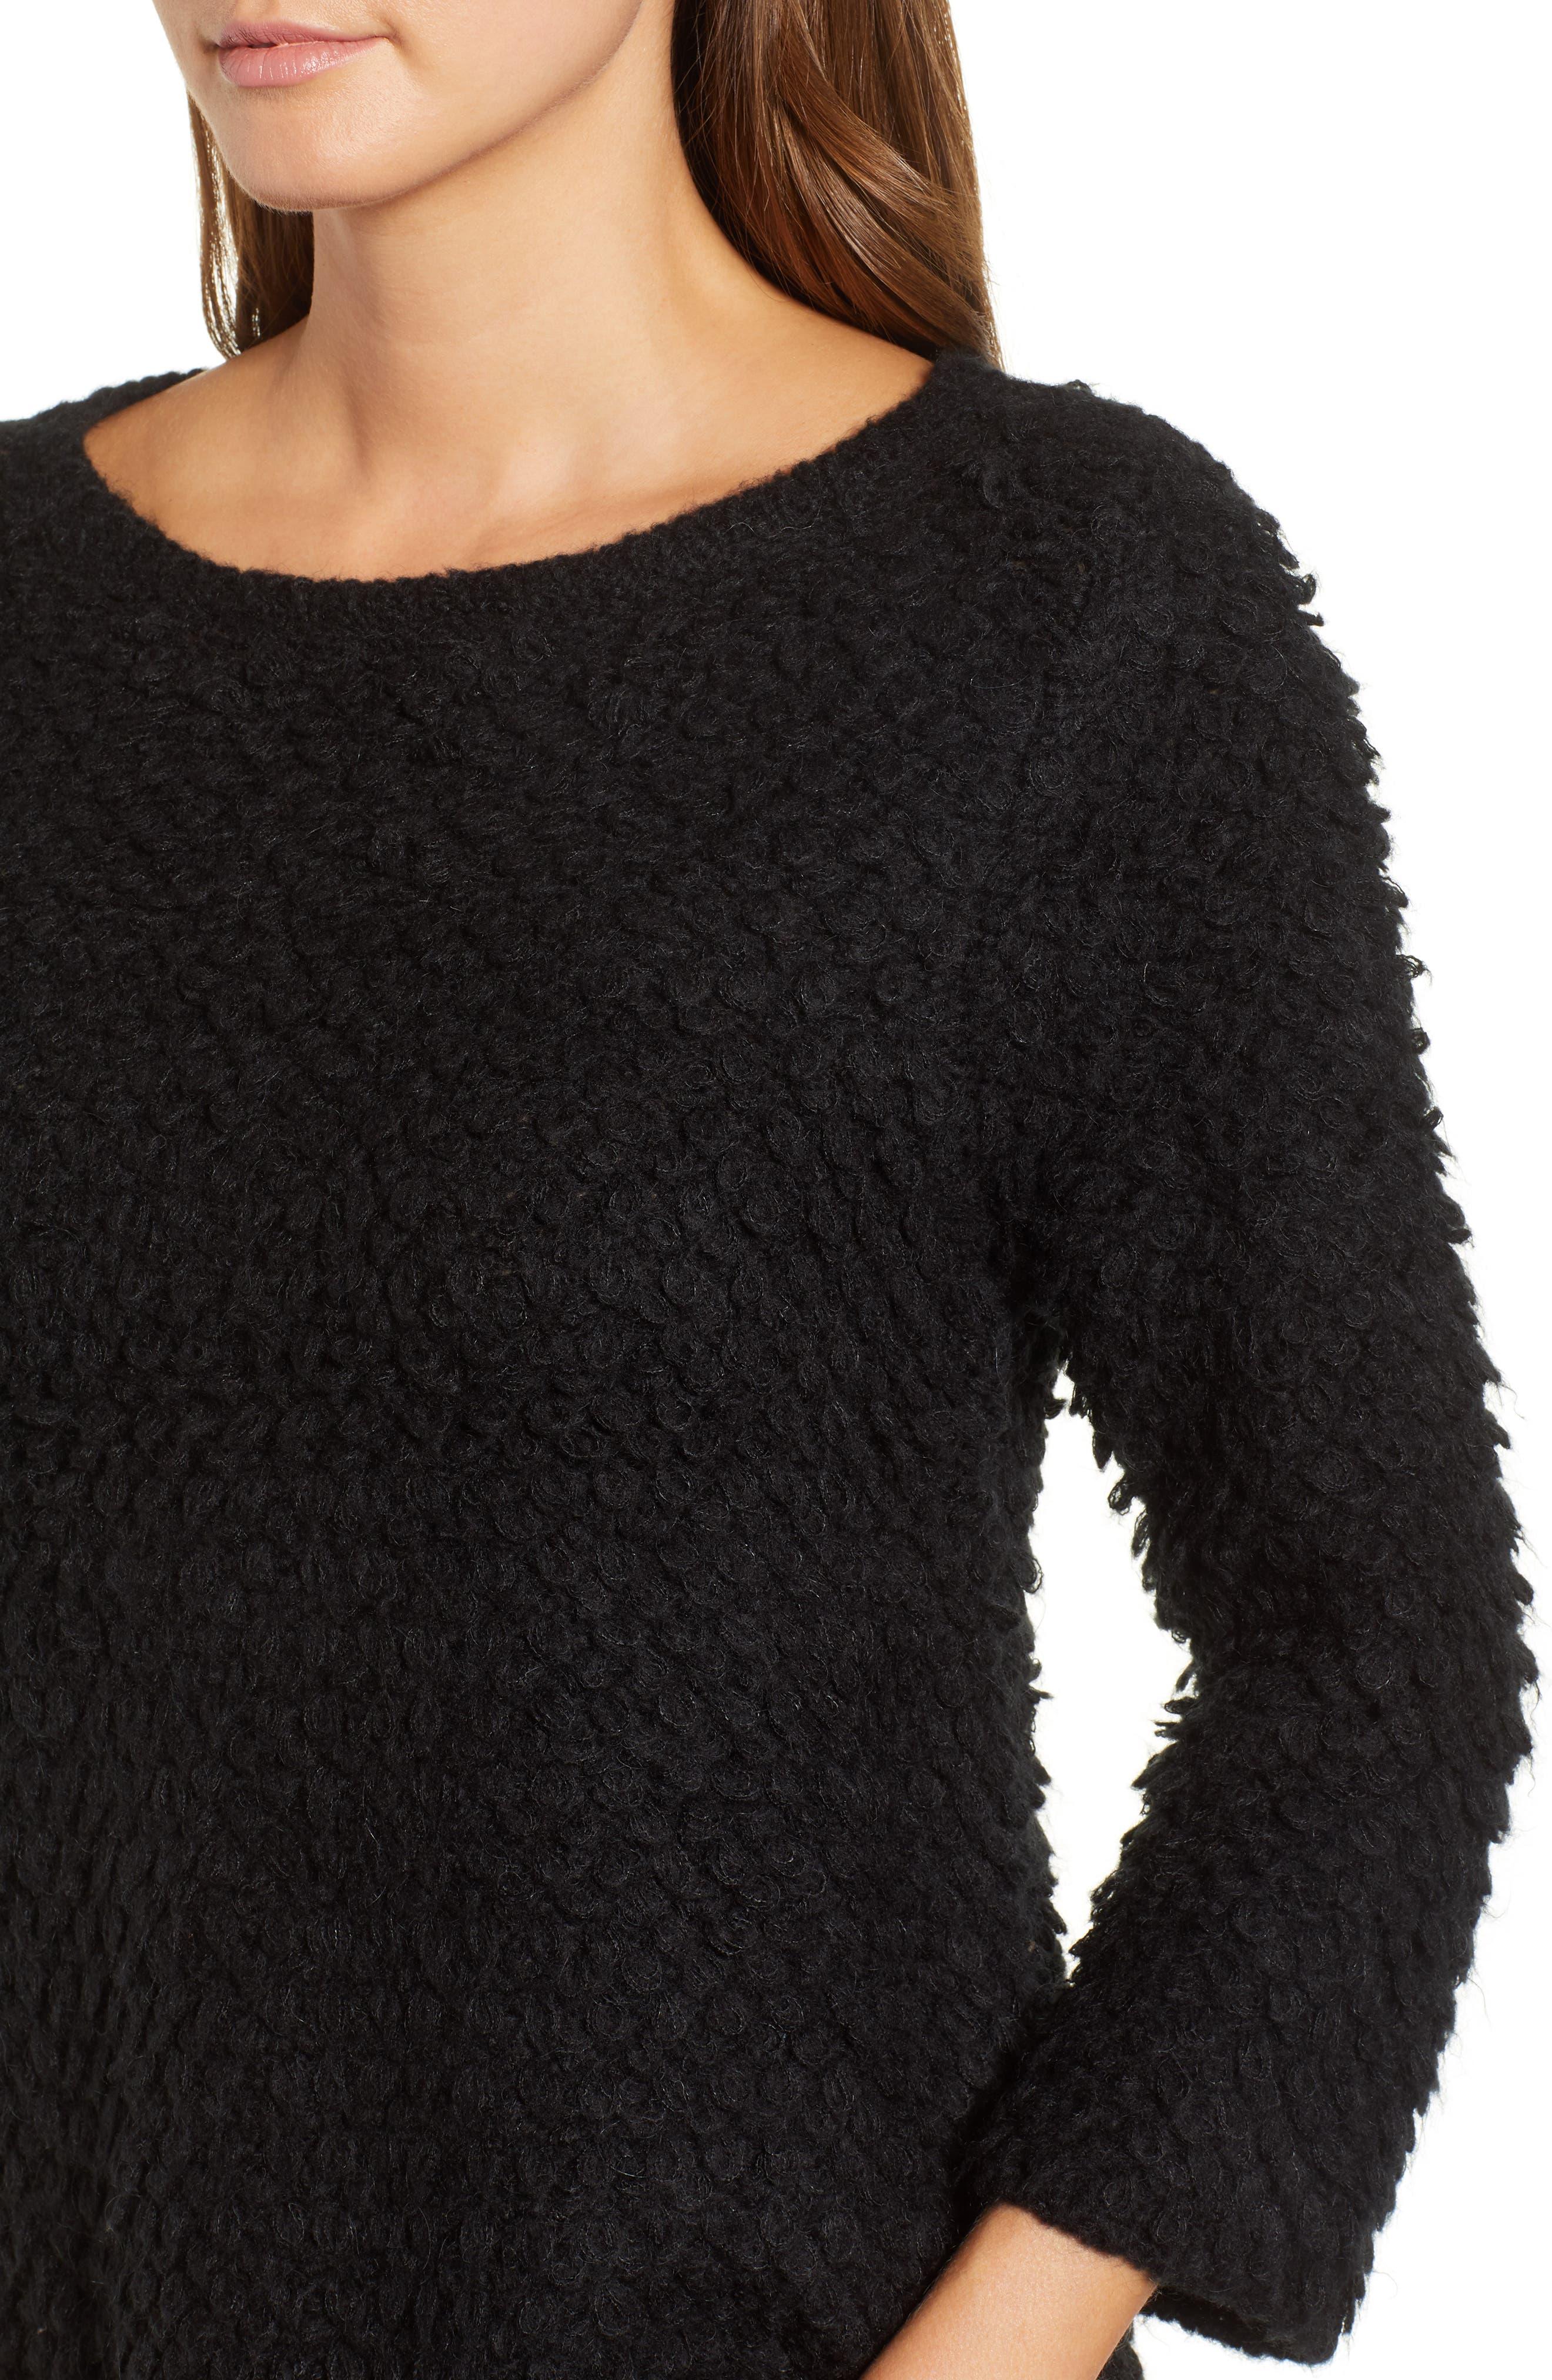 Loop Stitch Crewneck Sweater,                             Alternate thumbnail 4, color,                             Black